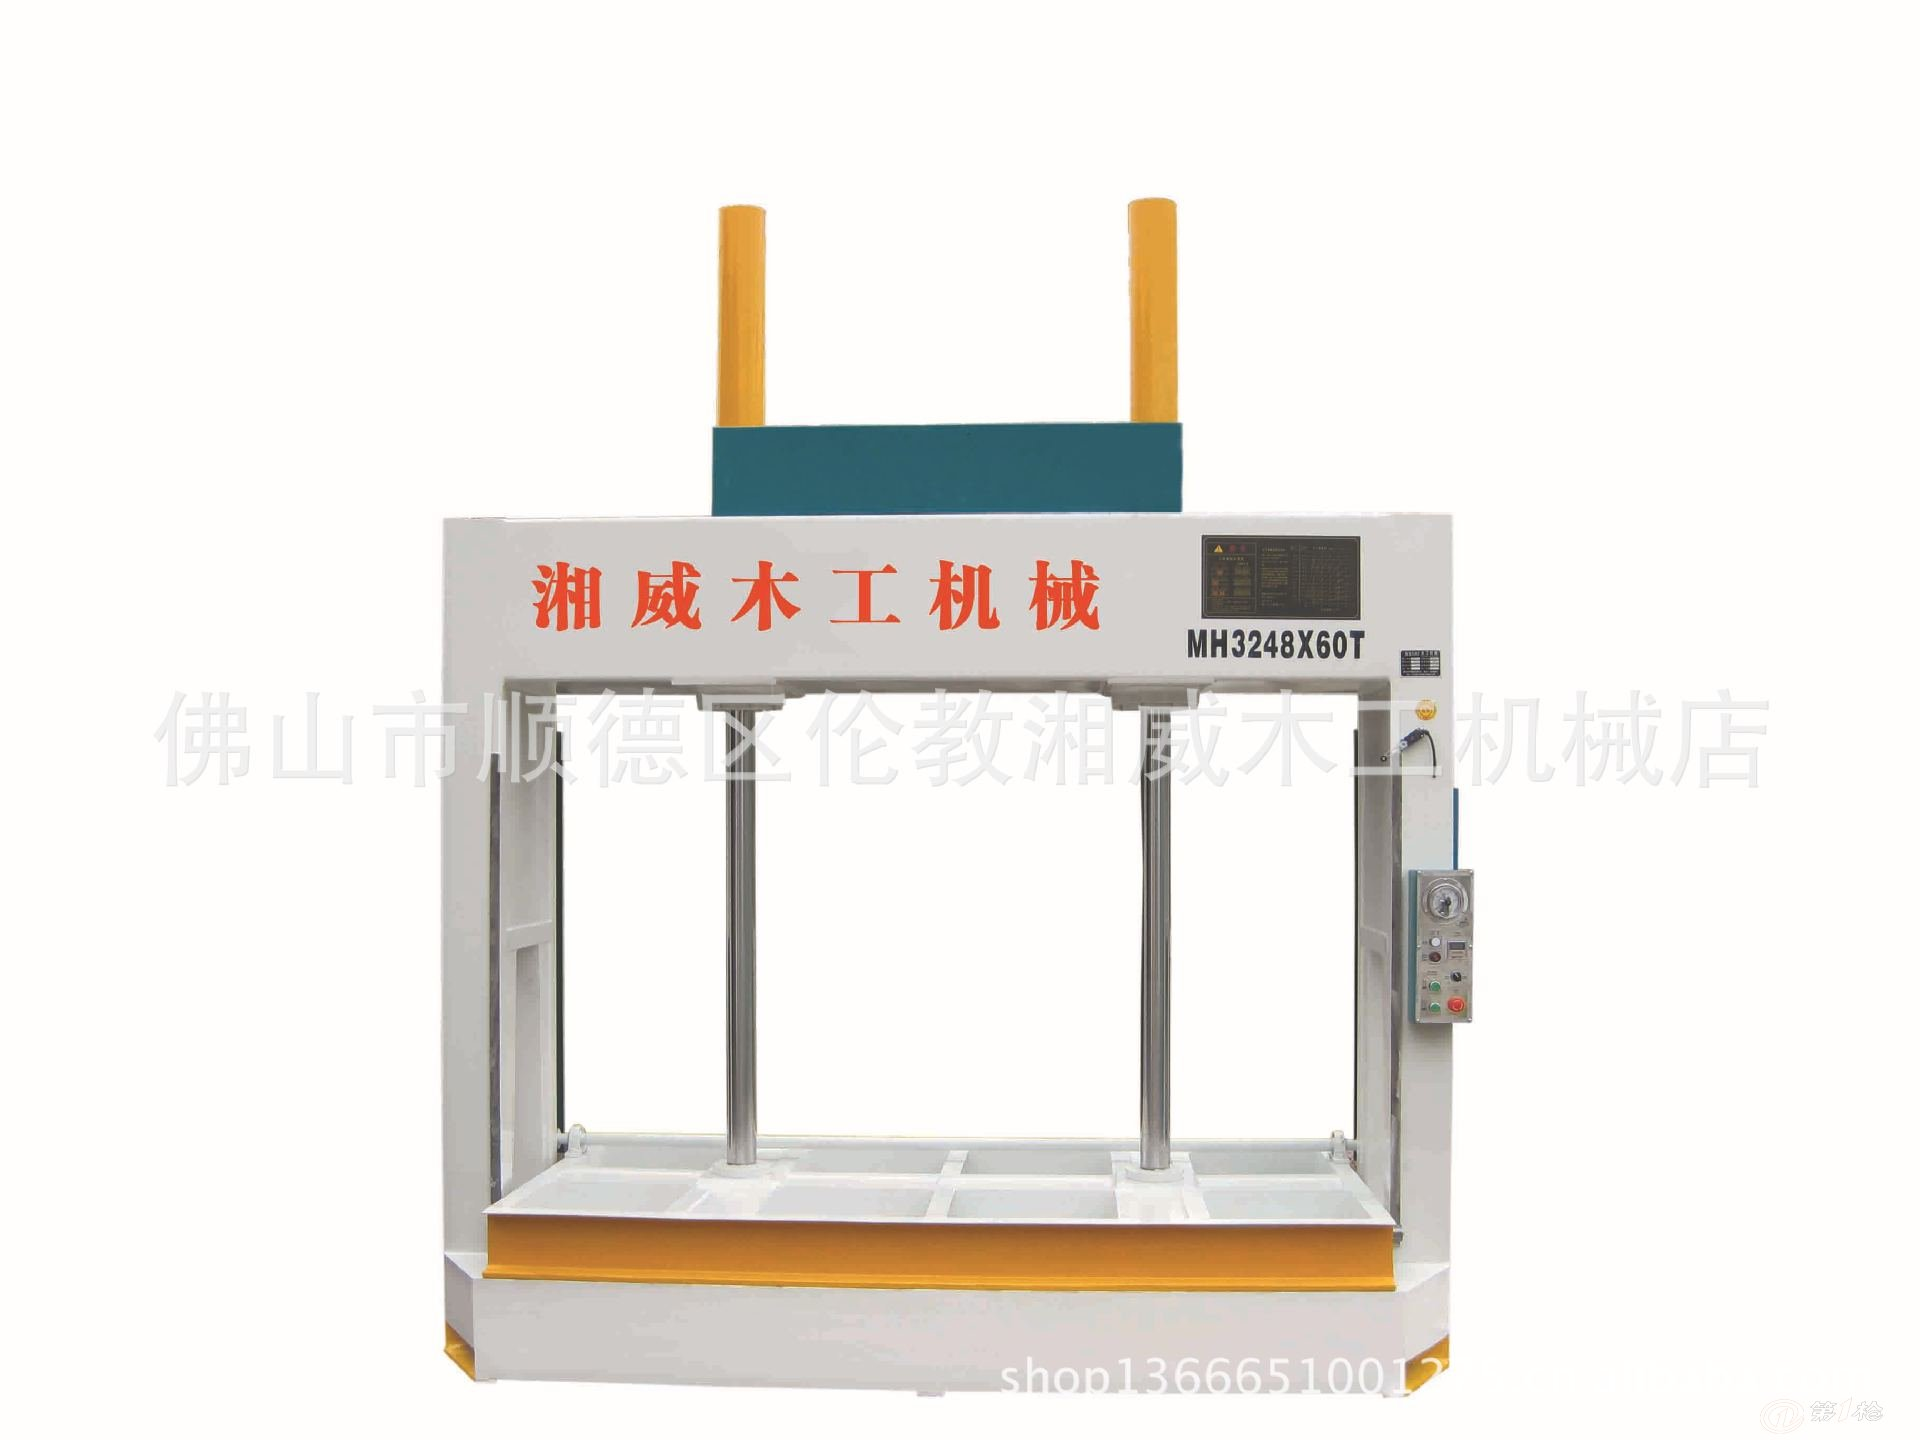 MH3248X60液压式冷压机 机床的用途和适用范围: 适用于现代流行板式、平台胶合板、刨花板、贴面板、各种人造板、家私制作、实木家私、音箱、塑料和其他压件木模等的加工与制造。机床操作简便、加工准确、快捷、工效高,是各种人造板材、板式家具、实木家私生产制造不可缺少的压件设备。 *采用自动、手动控制功能,可选择自动、手动控制功能 *自动压力调节油路功能。 *自动加压、自动保压功能。 *安全保险装置。 *紧急安全制动功能。 *操作简单、设计合理、性能稳定。 *机床内置全部采用安装优质的电器元件。 *工作台面全